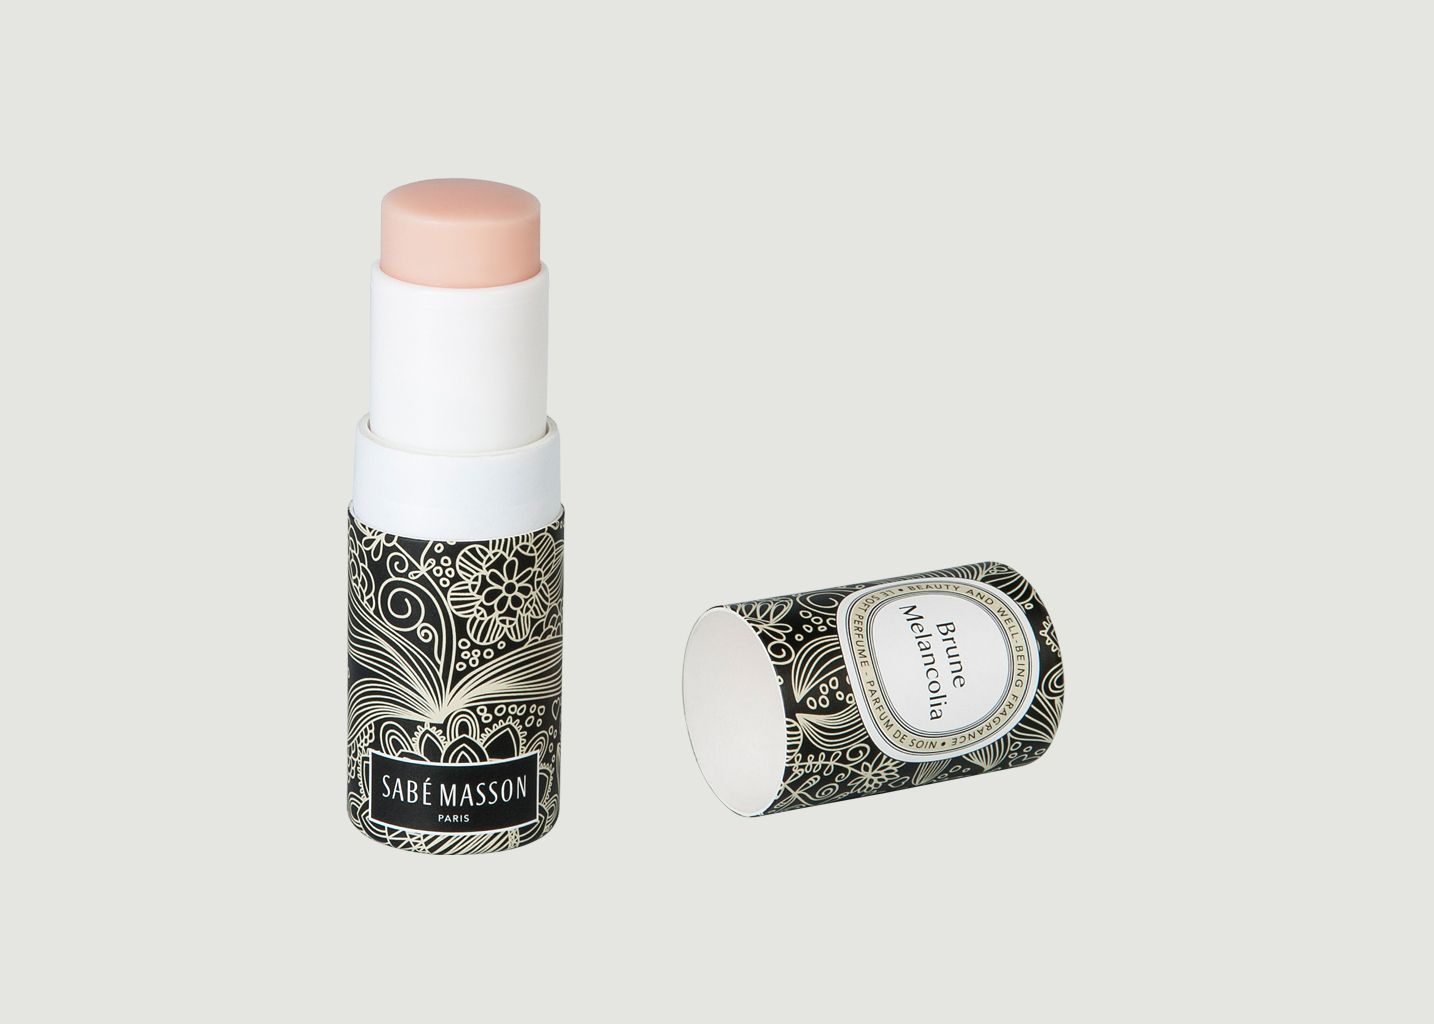 Soft Perfume Brune Melancolia - Sabé Masson